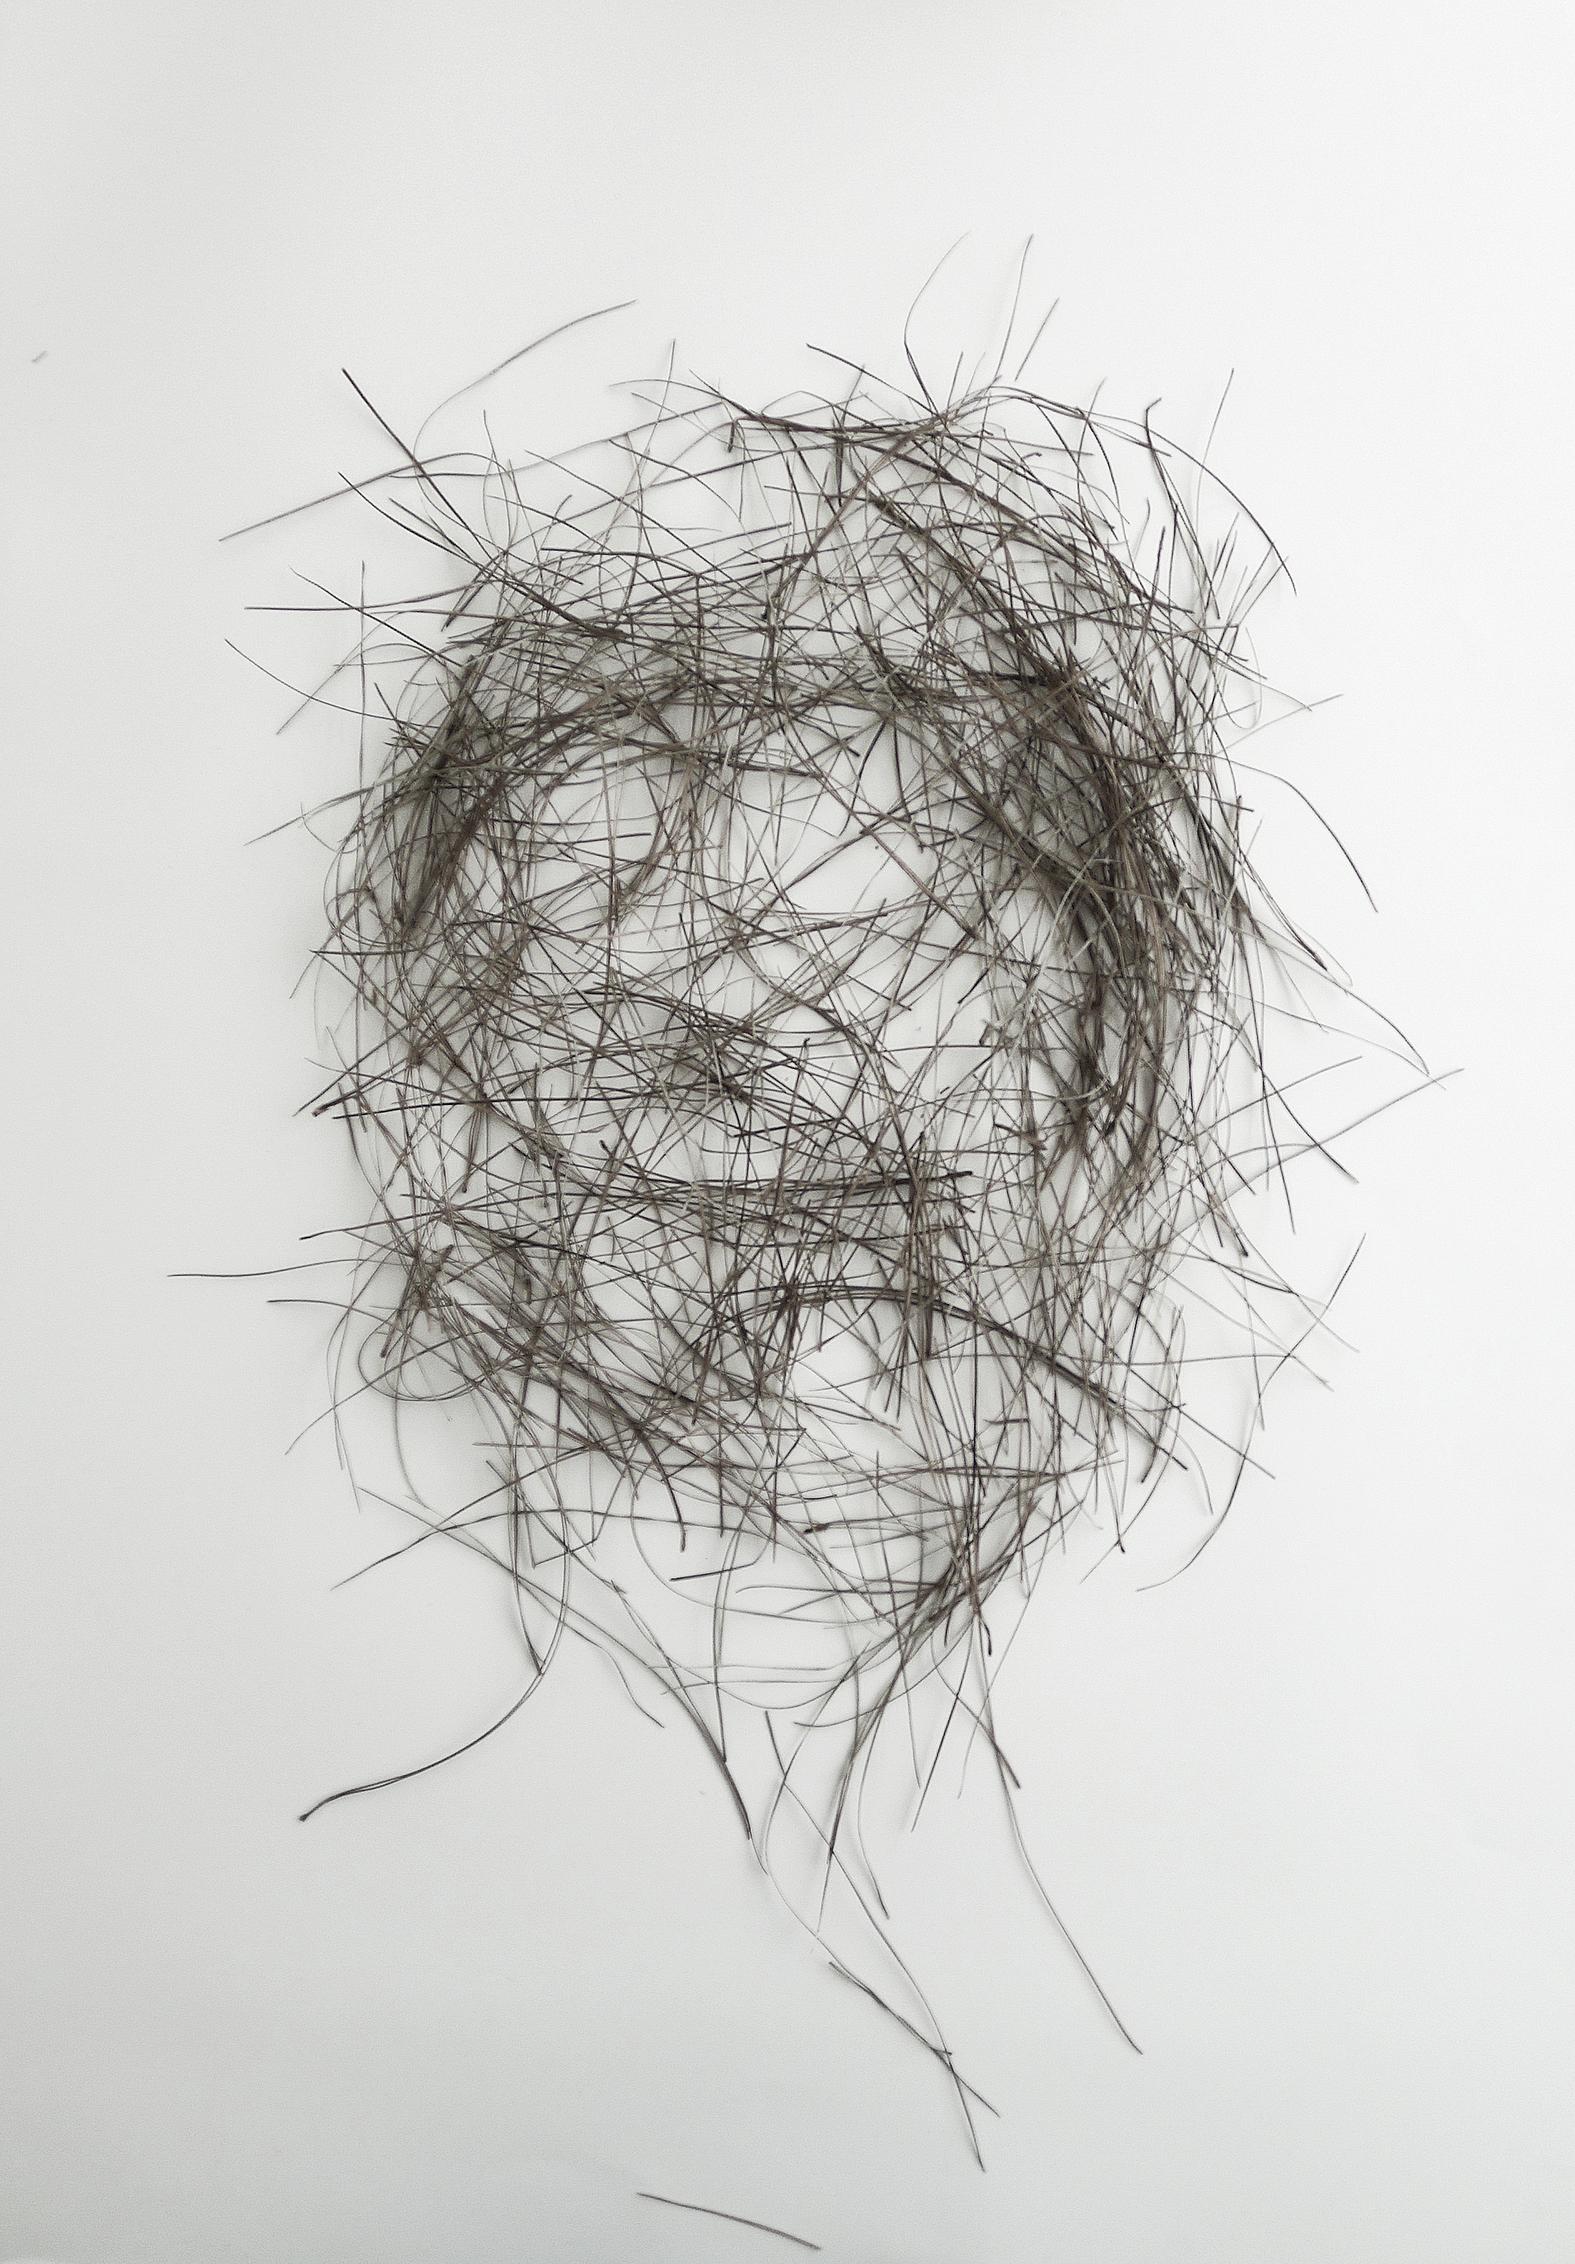 Head of innocents, pine needle drawing, 2015. Digital print on paper.